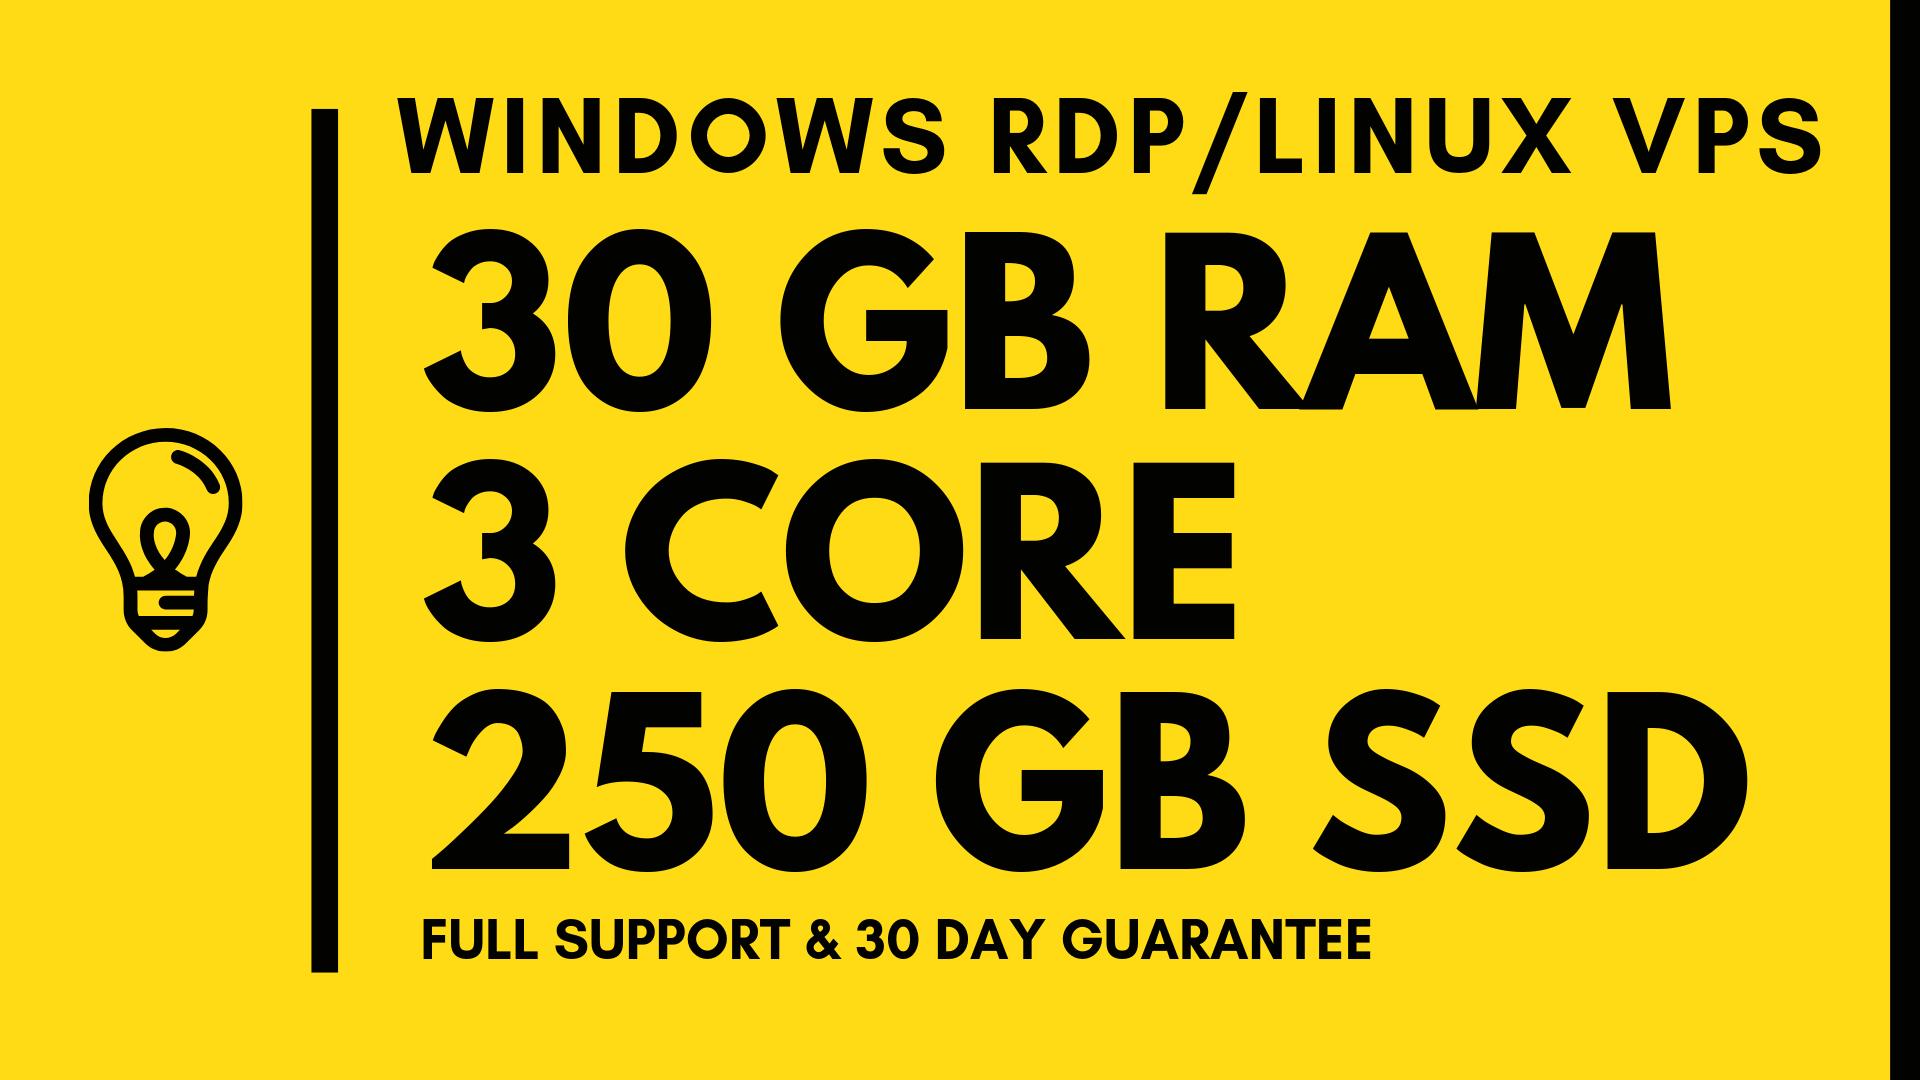 Windows VPS RDP 30GB RAM 3CORE 250GB SSD